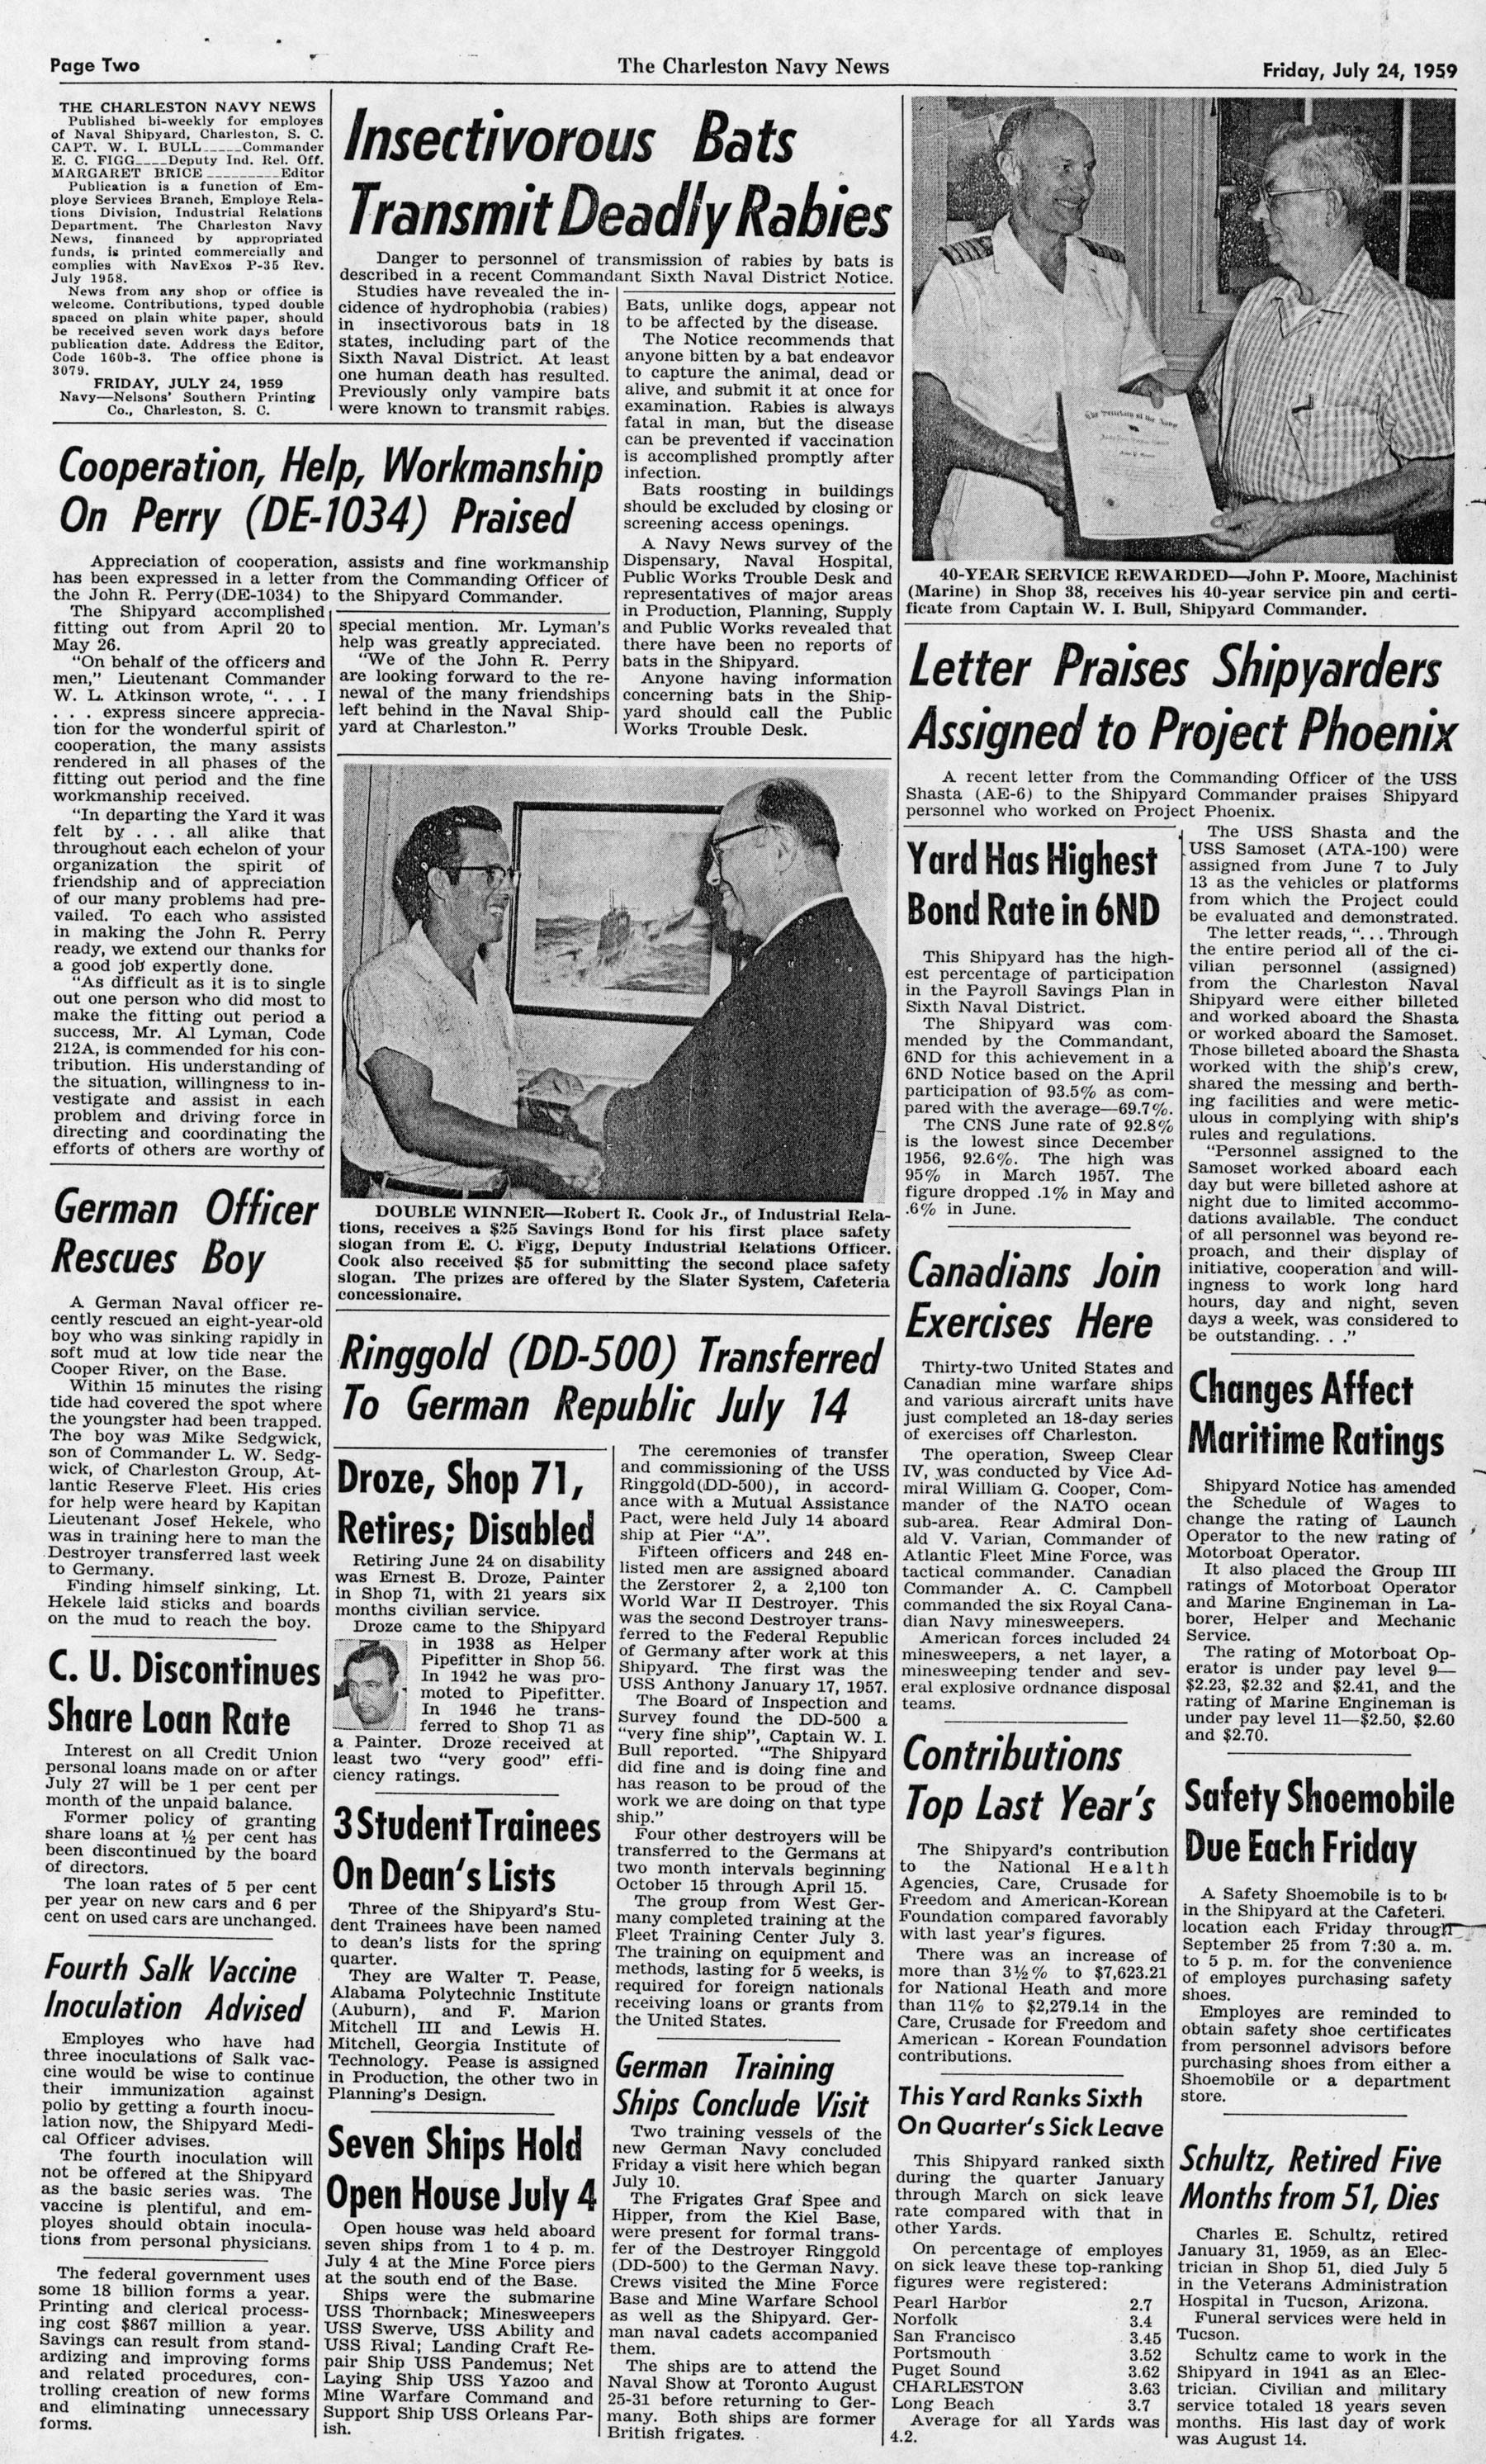 The Charleston Navy News, Volume 18, Edition 1, page ii